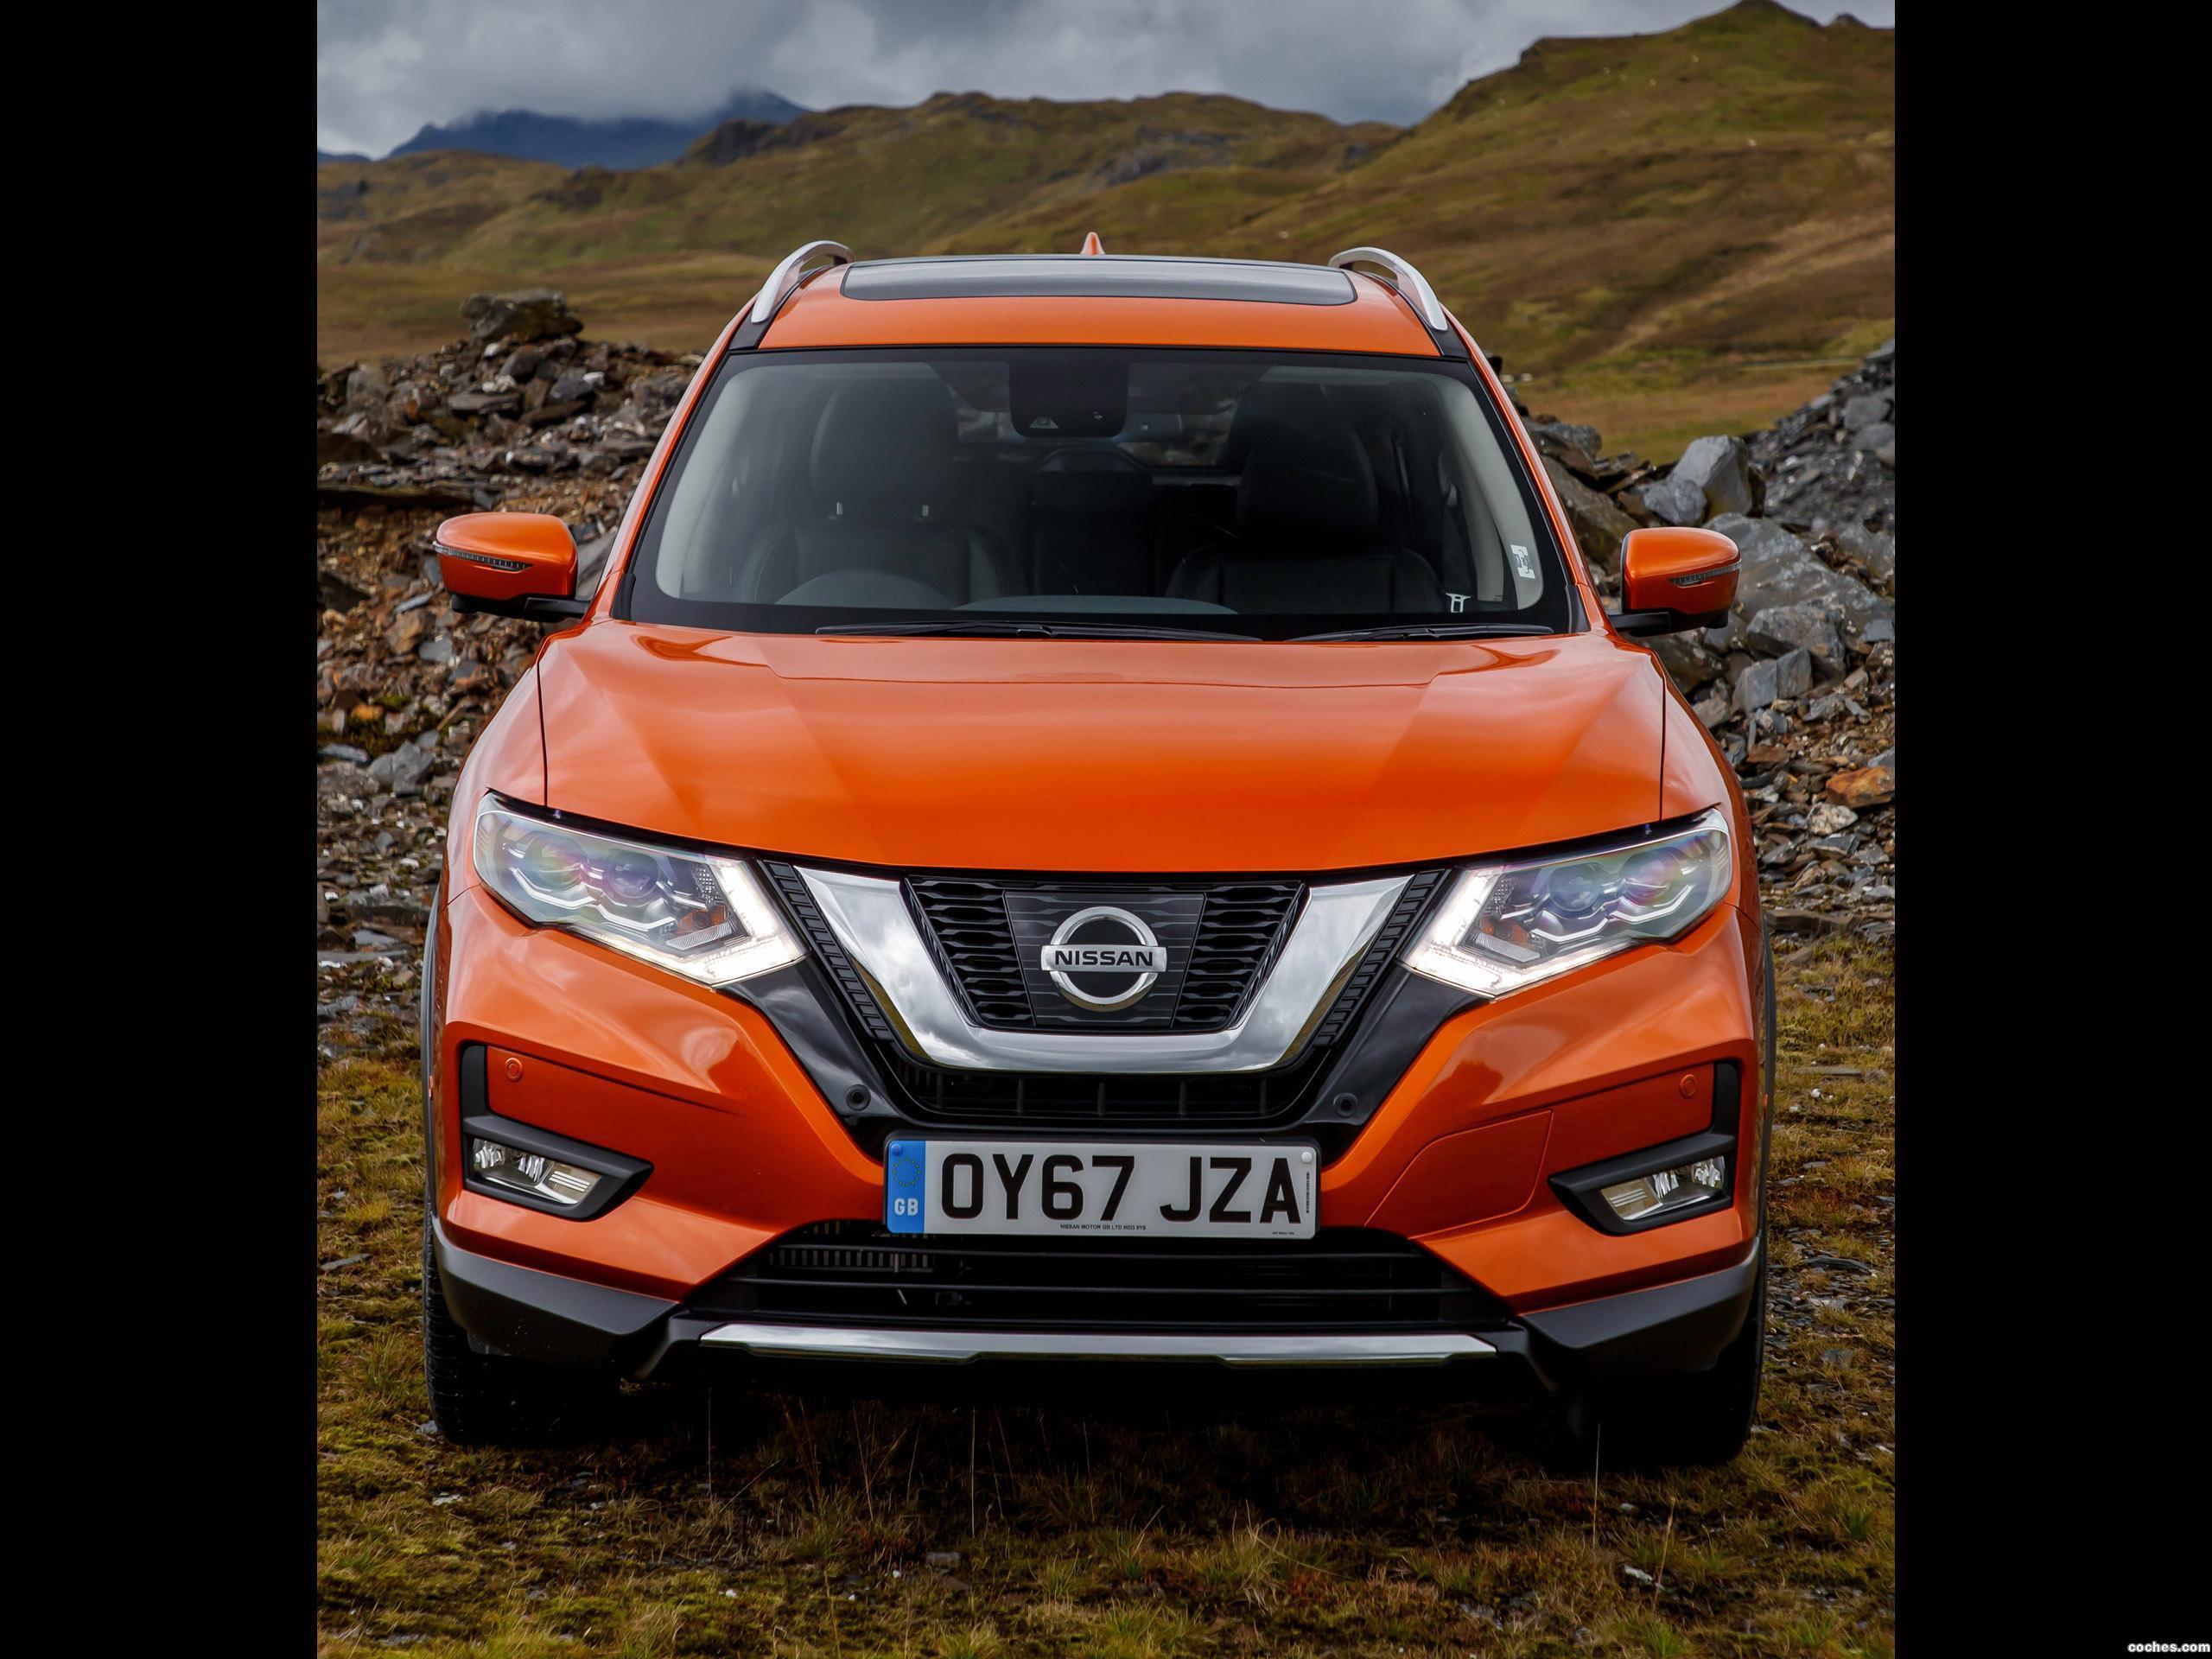 Foto 3 de Nissan X-Trail UK 2017